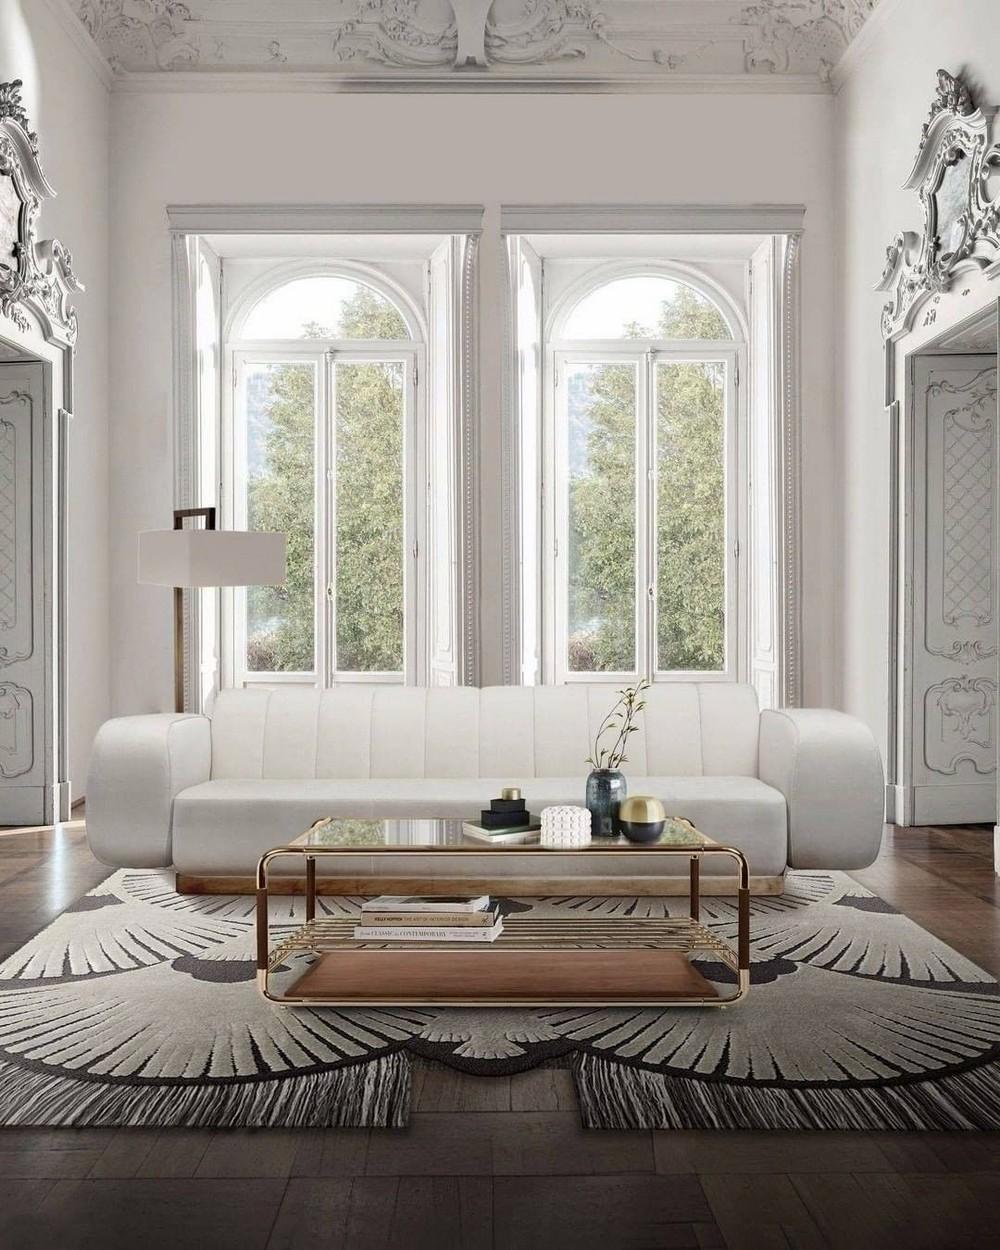 Sala de estar lujuosas: Inspiraciónes con un Diseño de Interior moderno